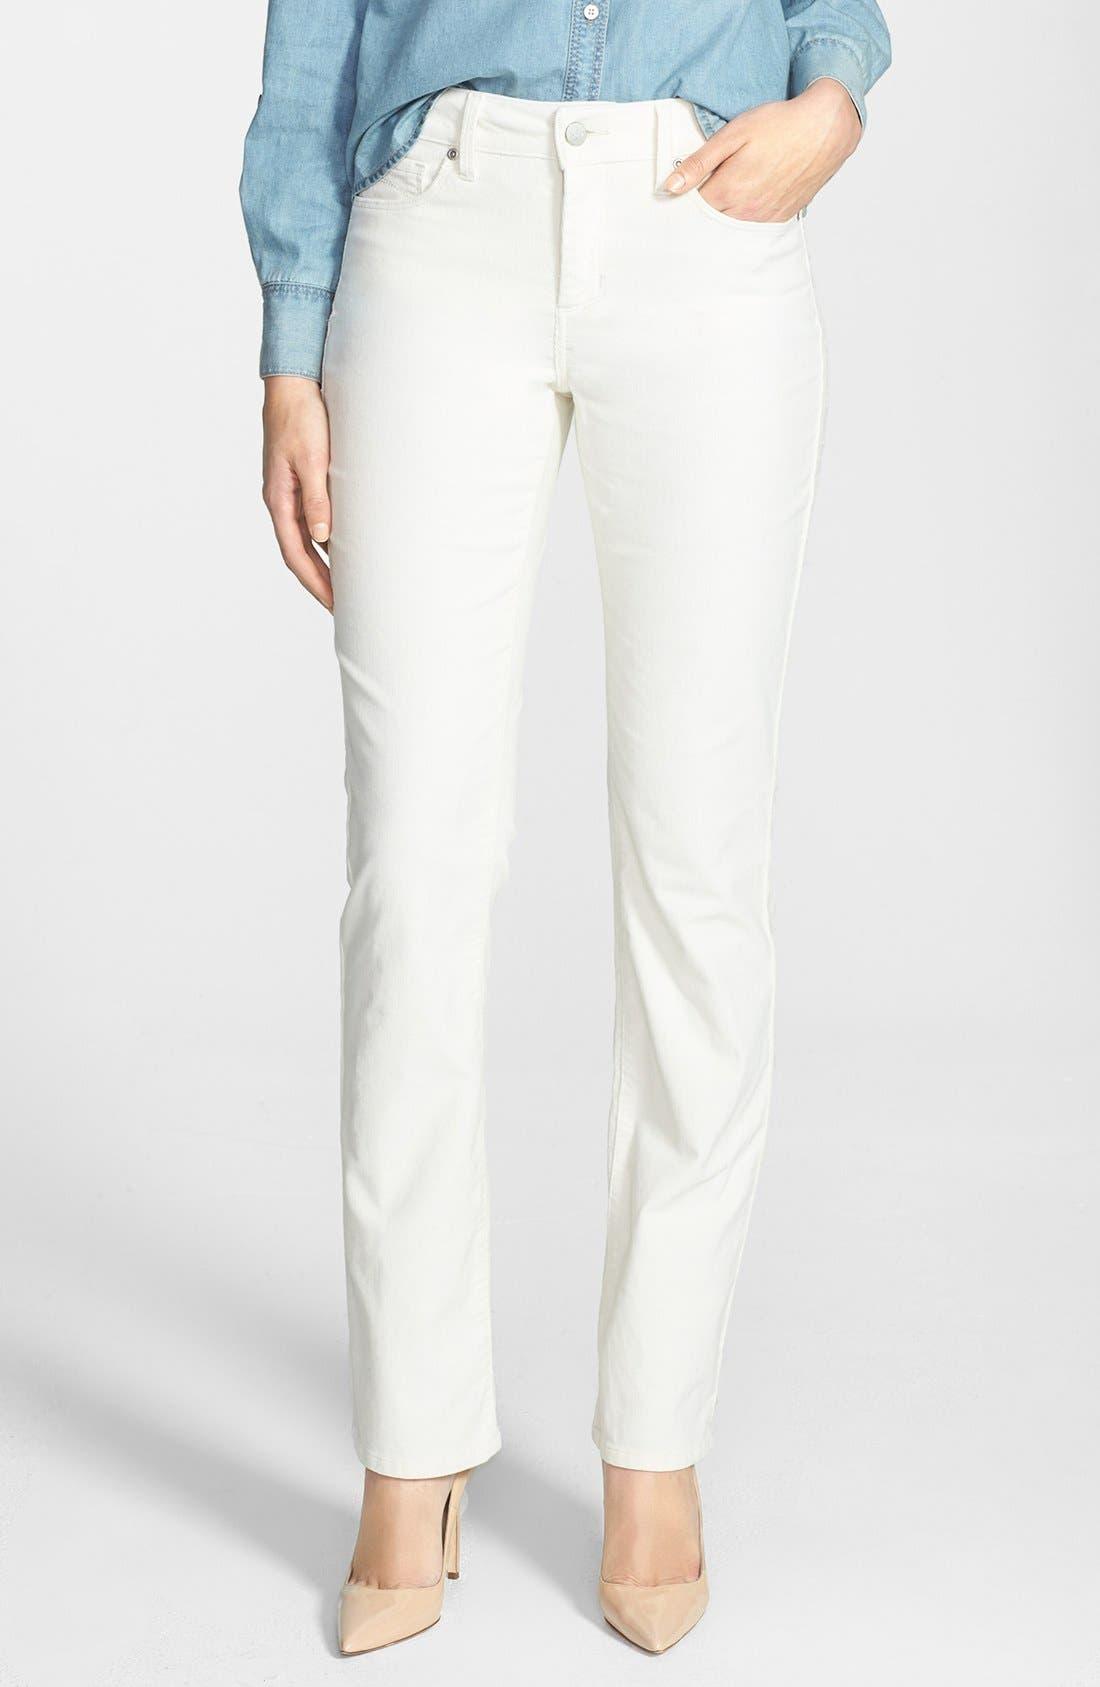 Main Image - NYDJ 'Marilyn' Colored Stretch Corduroy Straight Leg Pants (Petite)